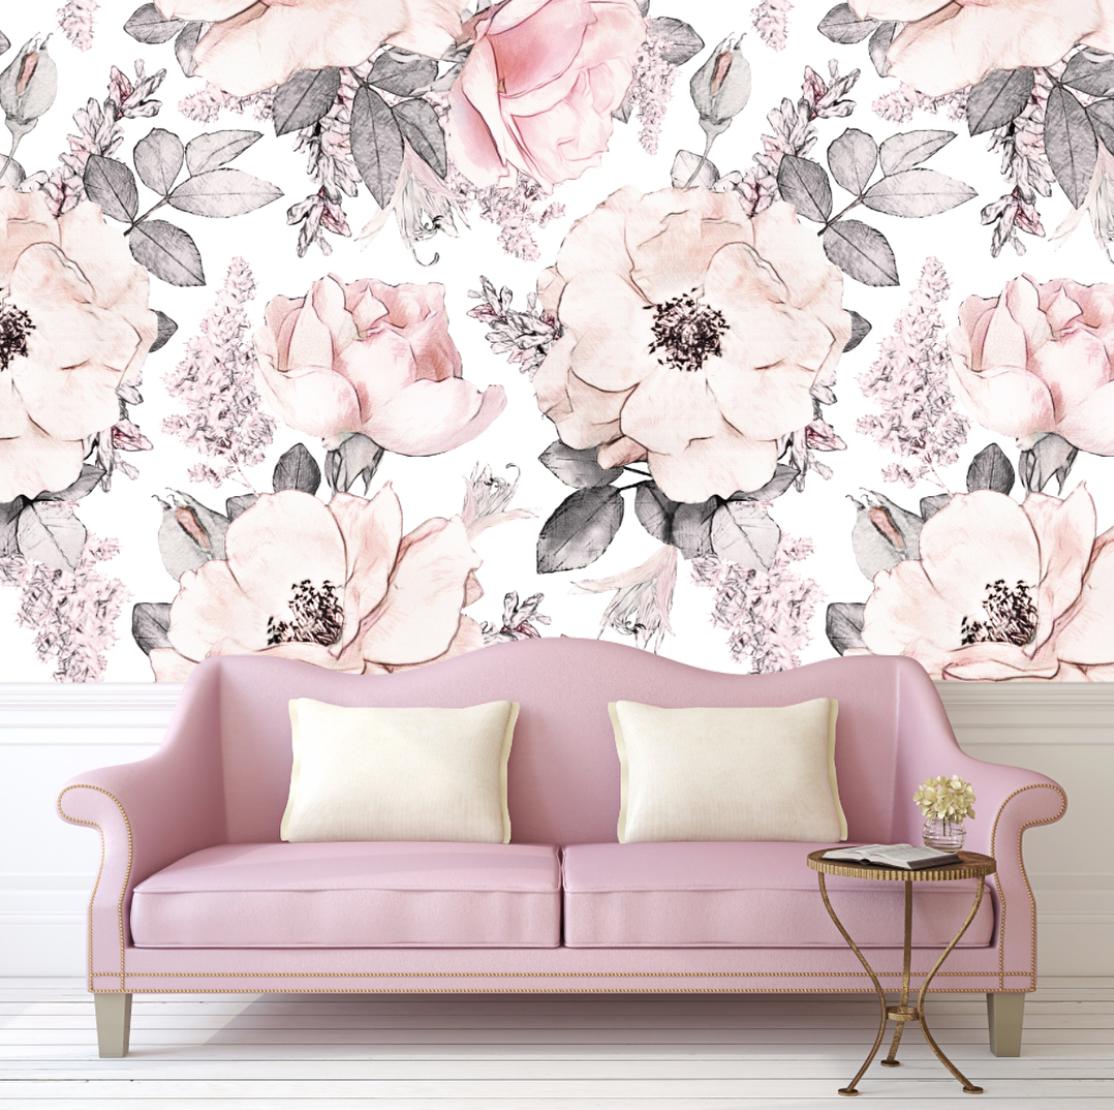 vintage floral wall decals urban walls - HD1024×1024